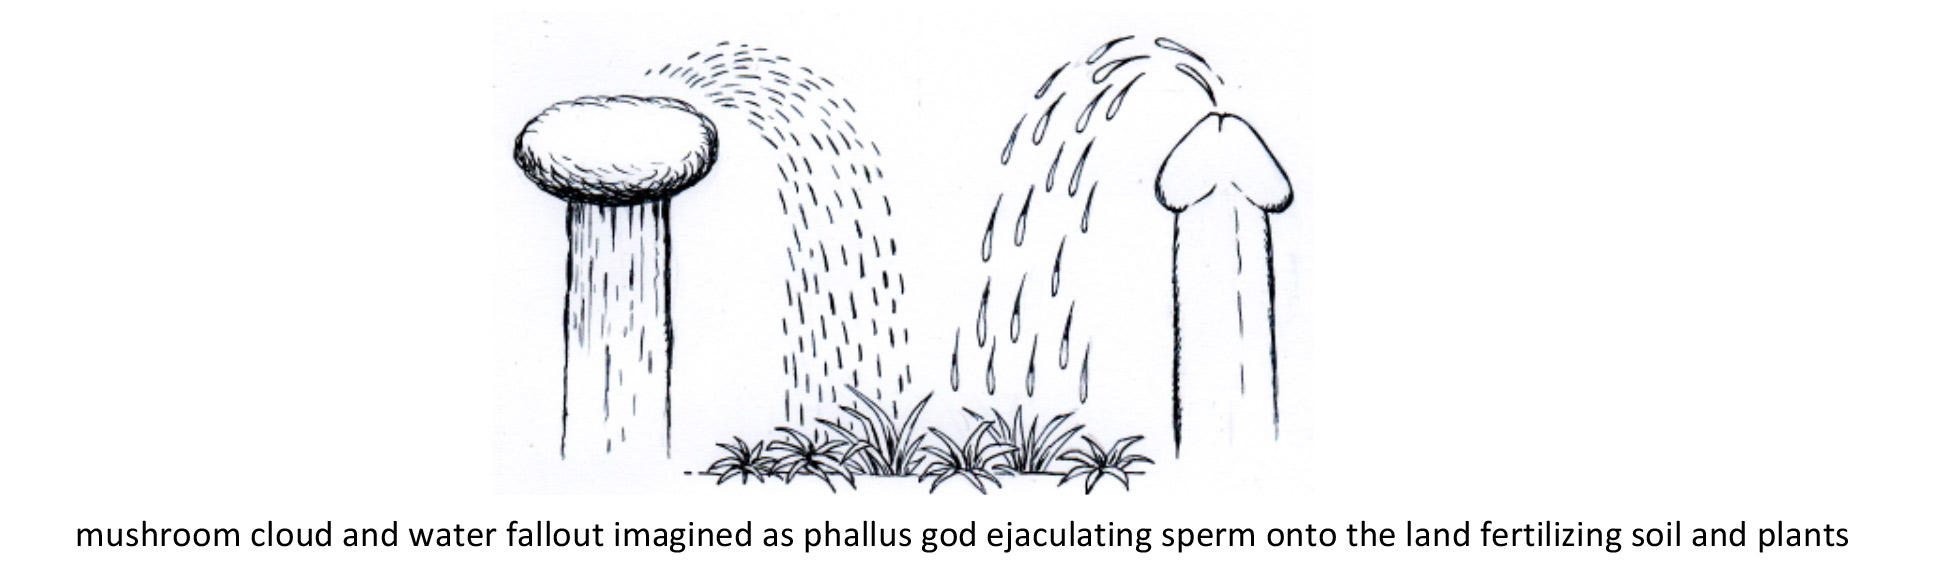 The sperm of god symbol